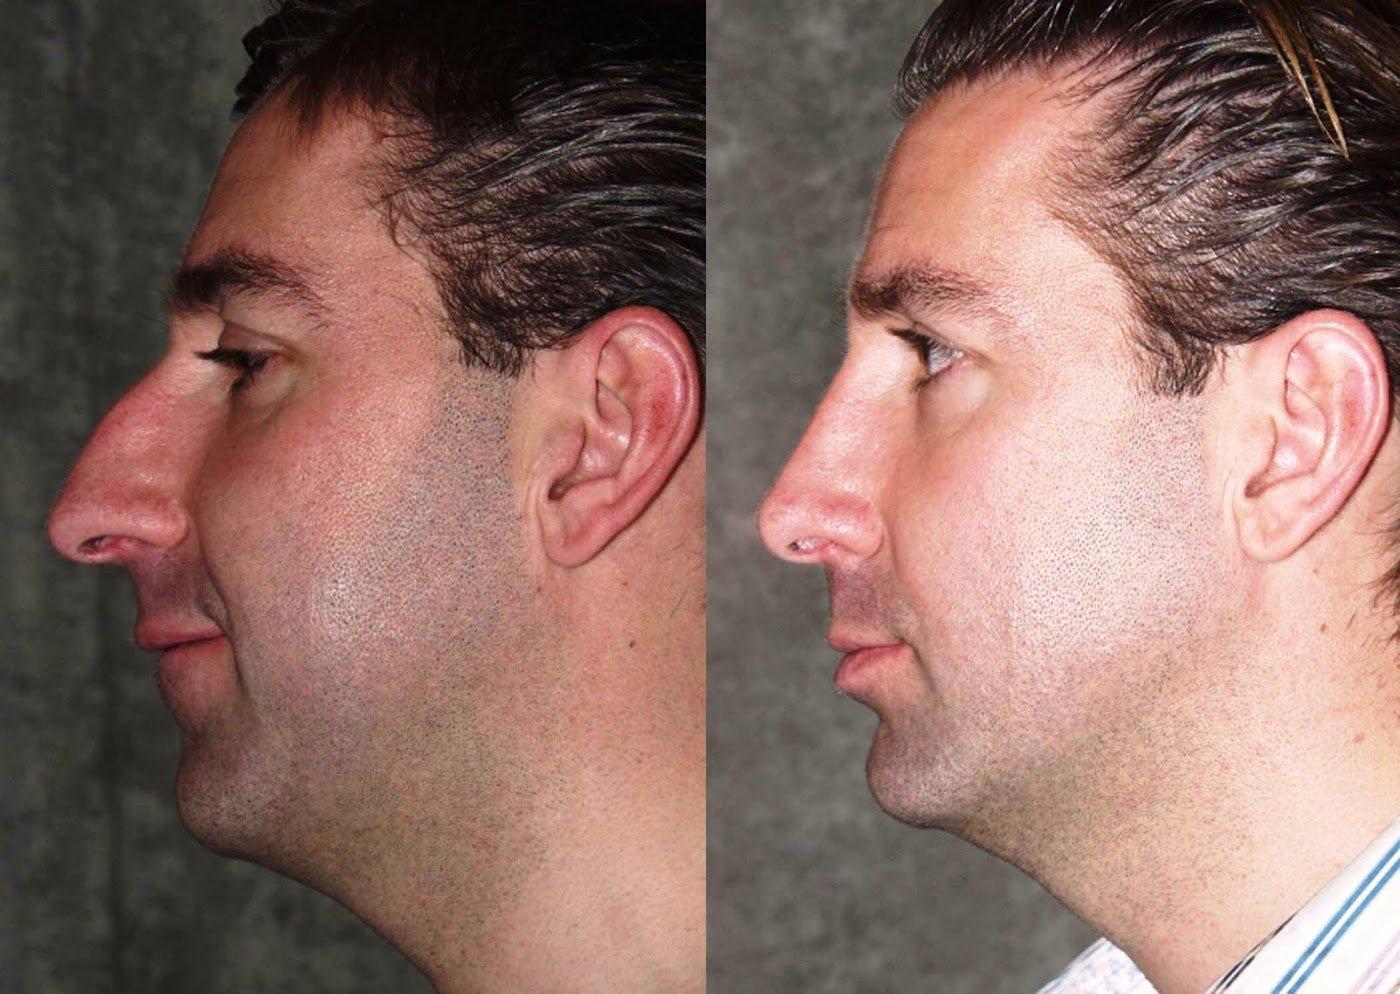 Rhinoplasty one year follow-up side view